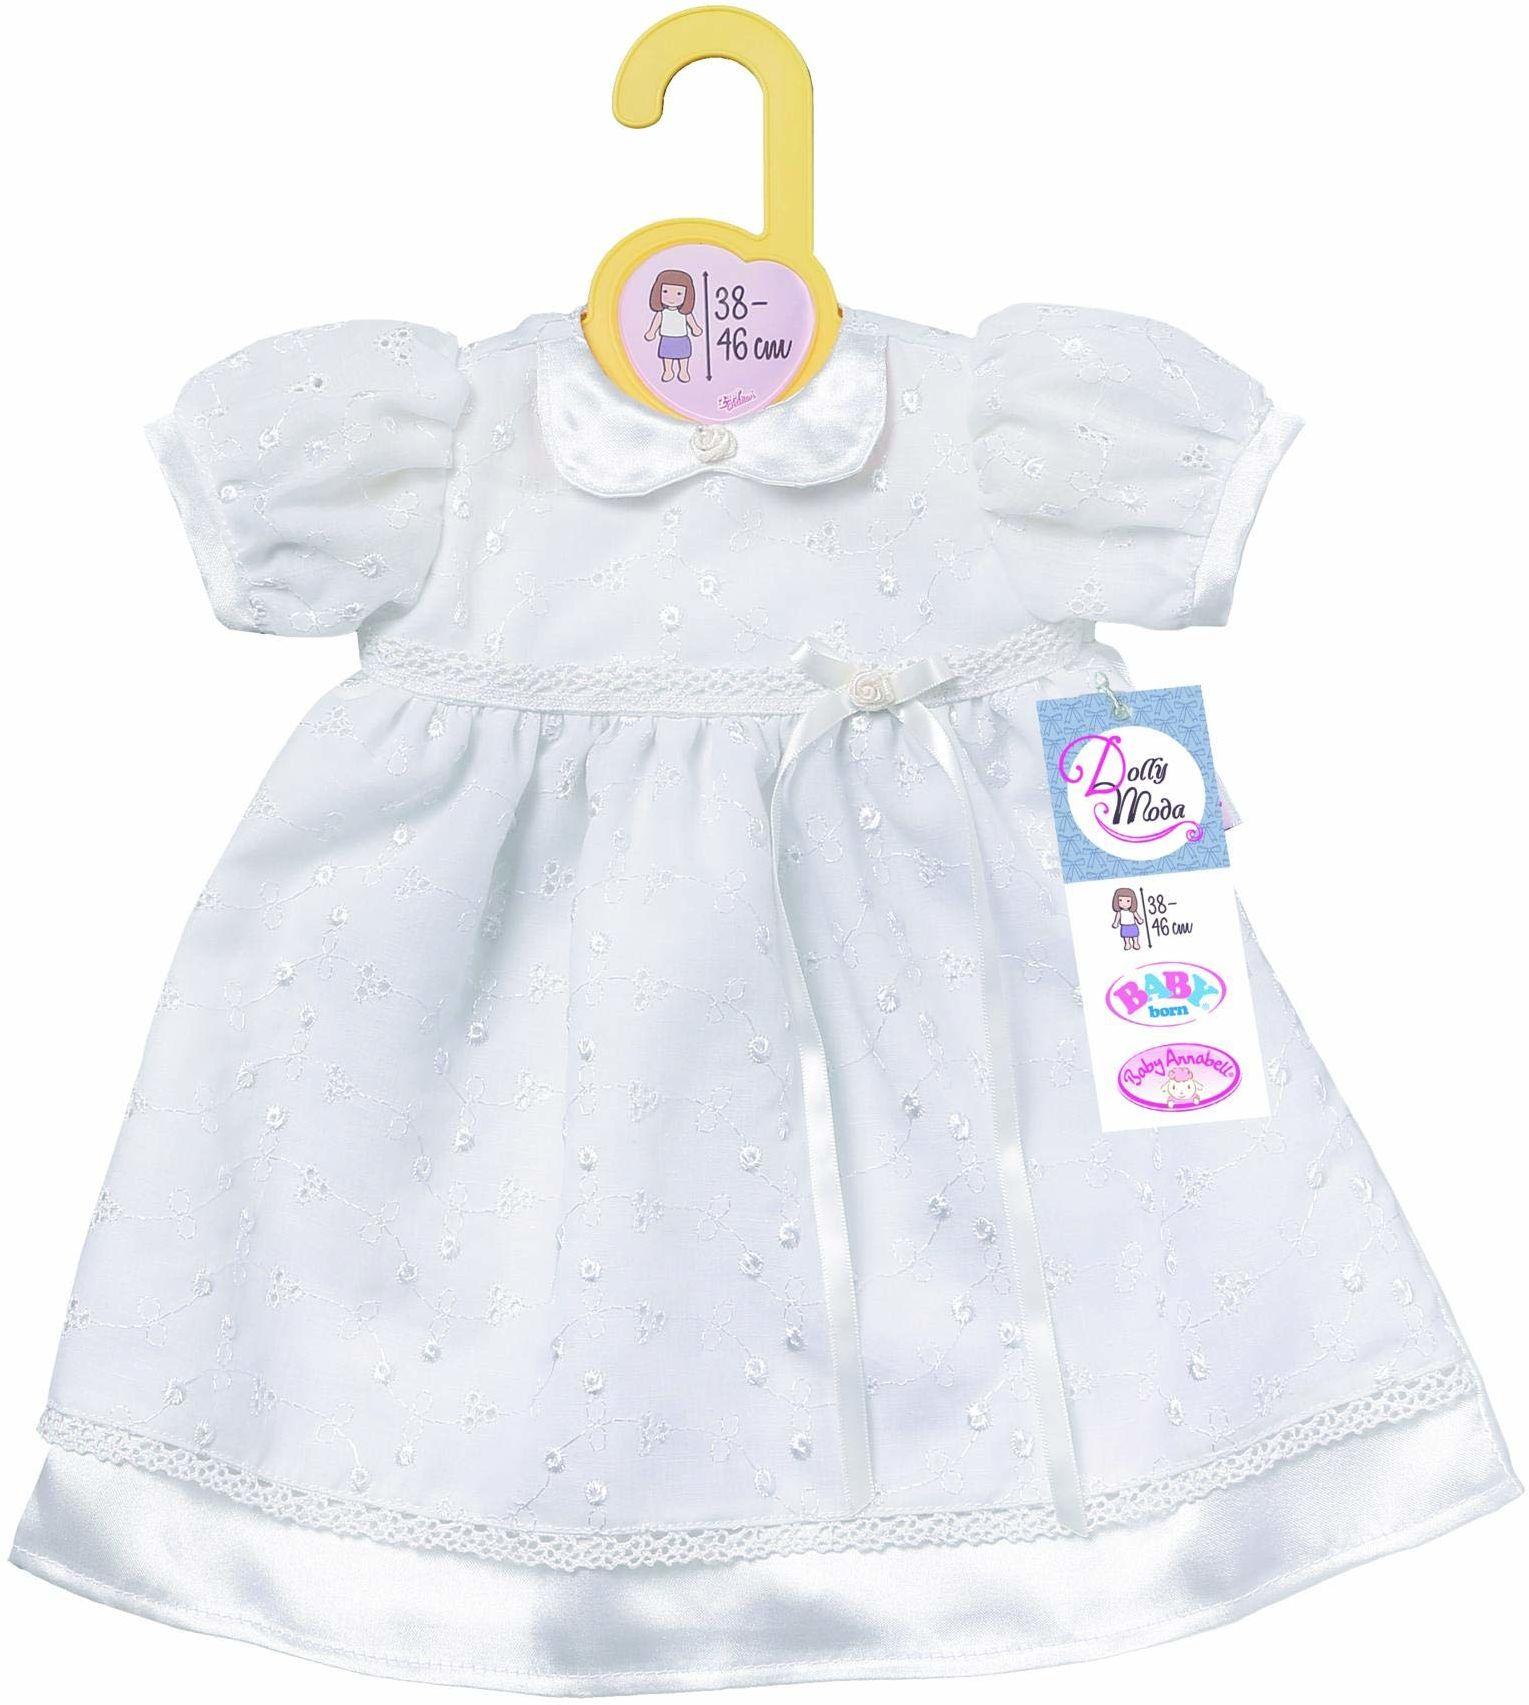 Zapf Creation 870341 Dolly Fashion szlafrok do chrztu dla lalek 38-46 cm